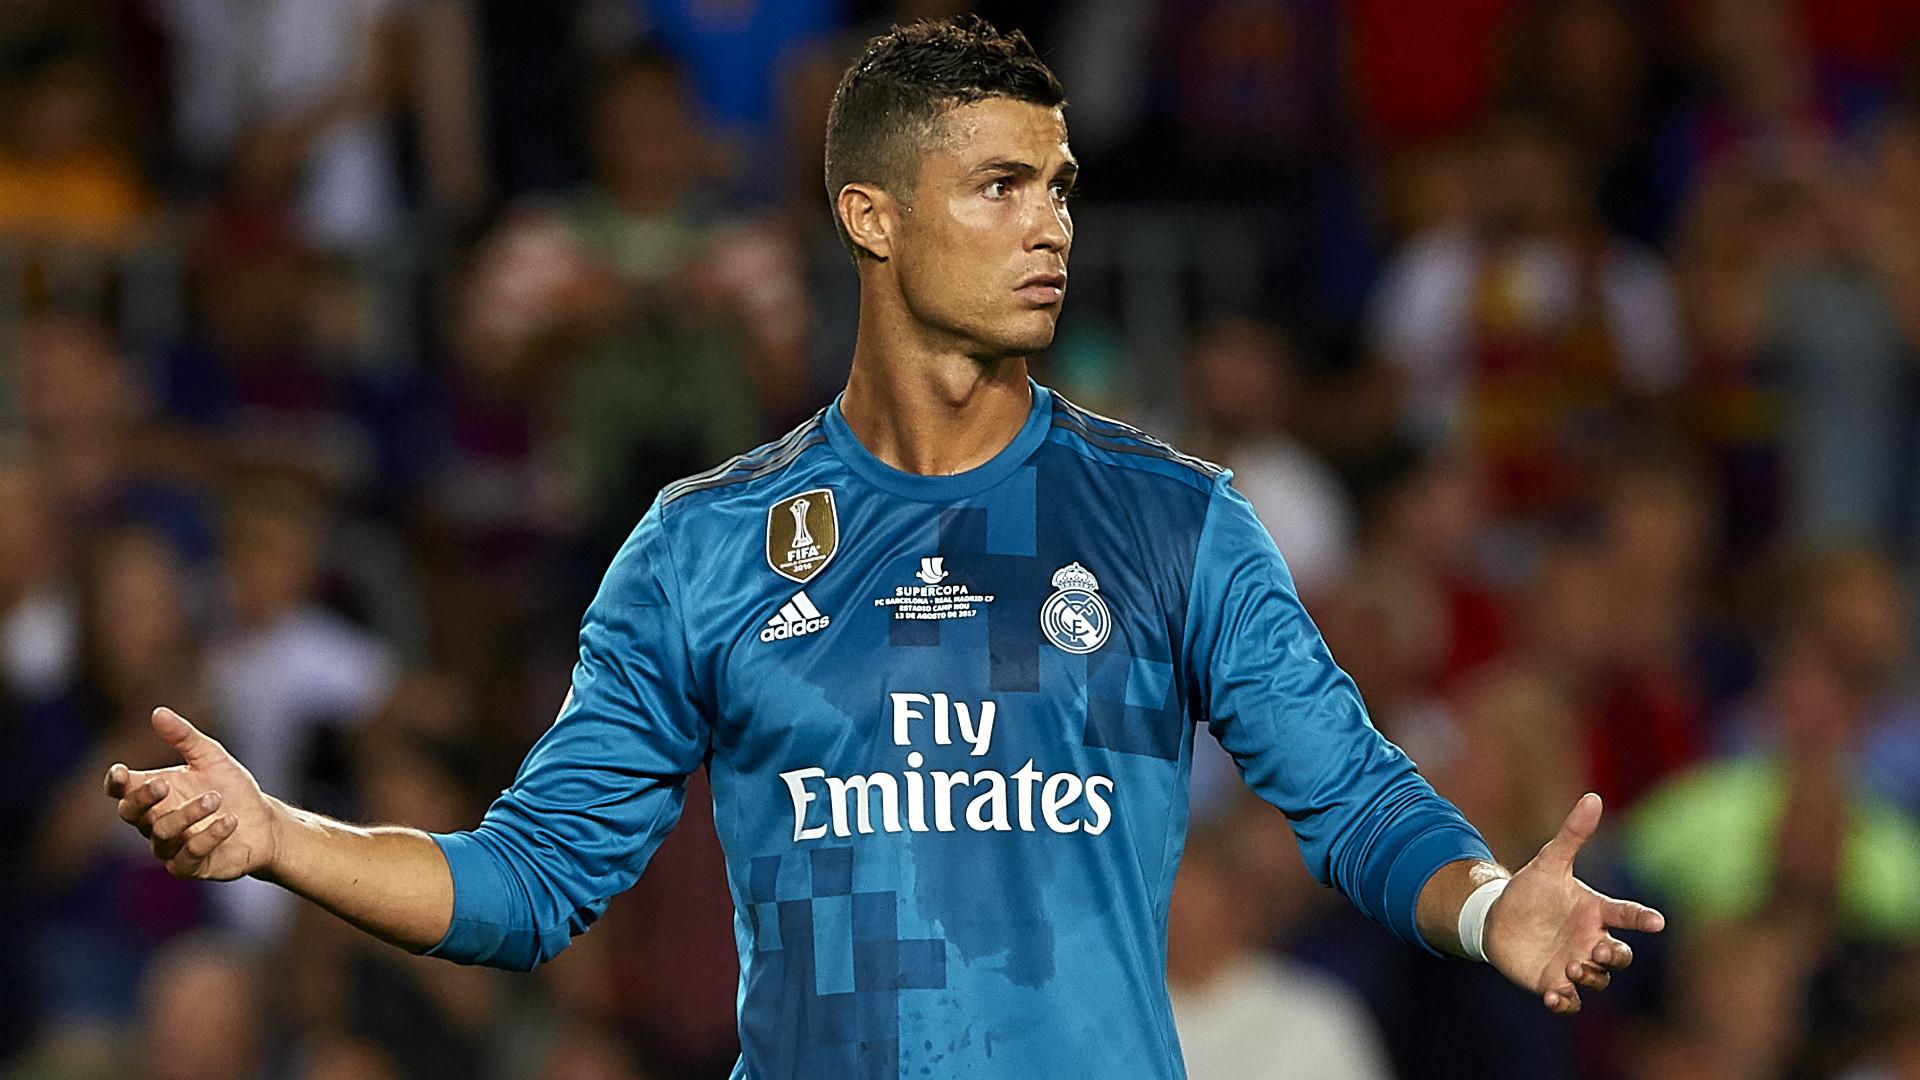 Cristiano Ronaldo Real Madrid 2017